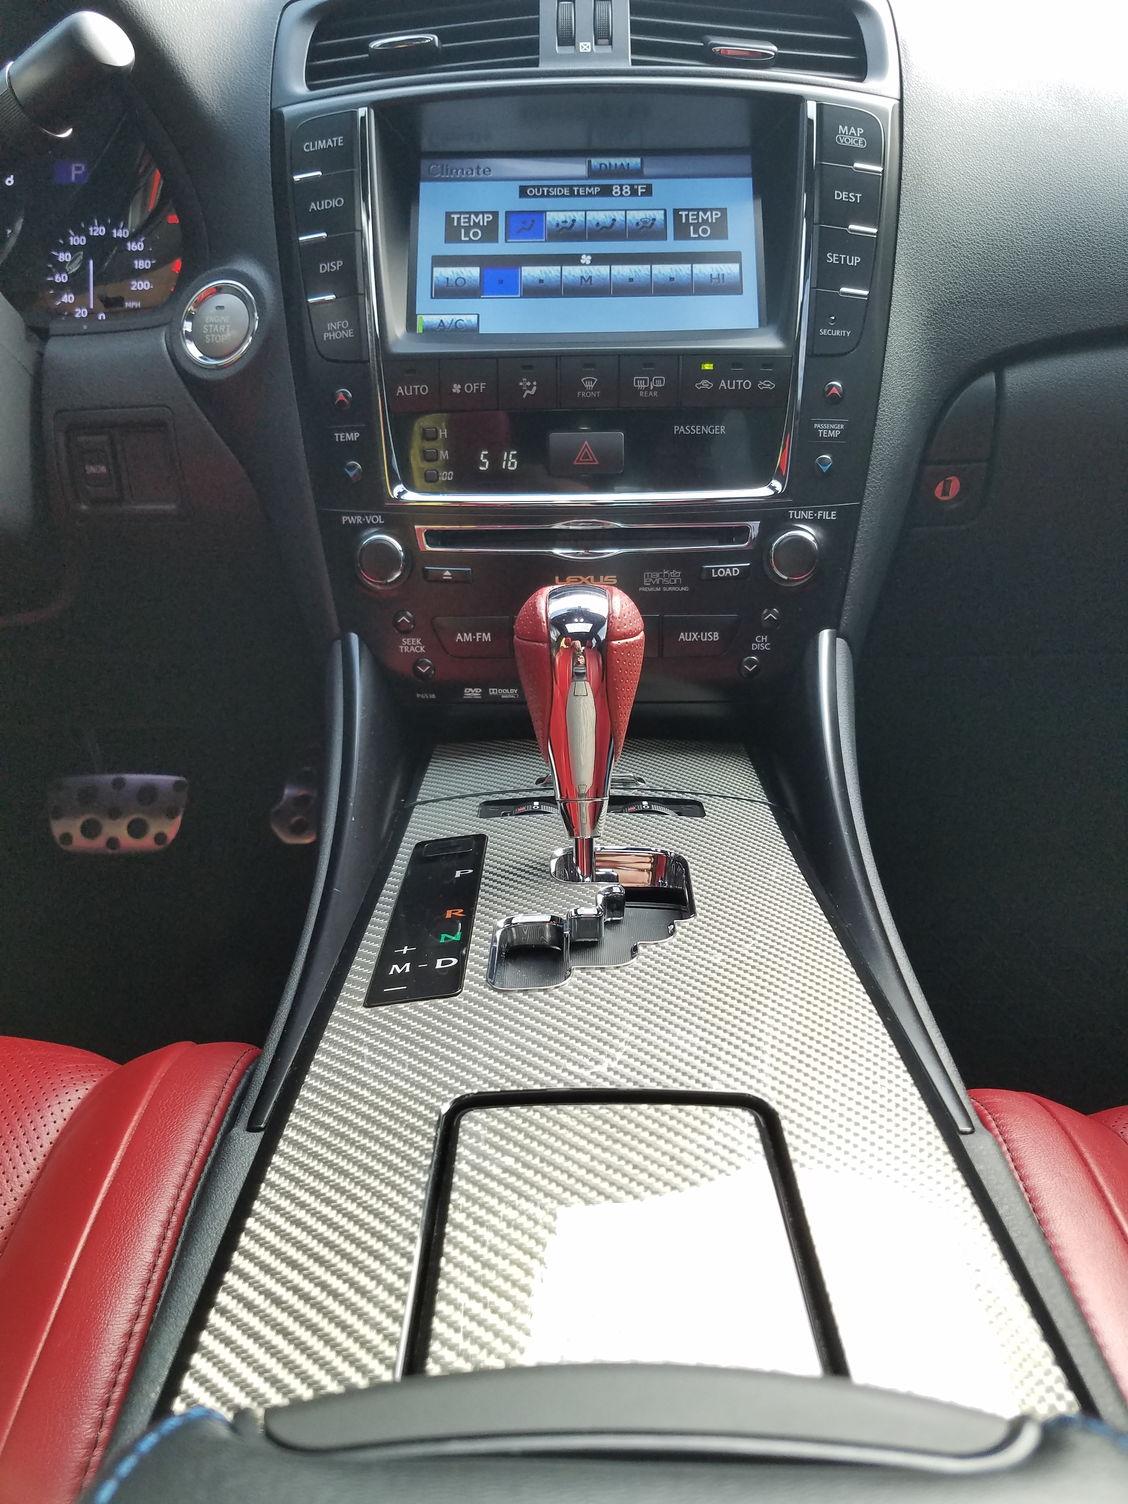 Longo Lexus Service >> CA Mint 2012 IS-F 51k Miles Nebula Gray w/ RED interior - ClubLexus - Lexus Forum Discussion